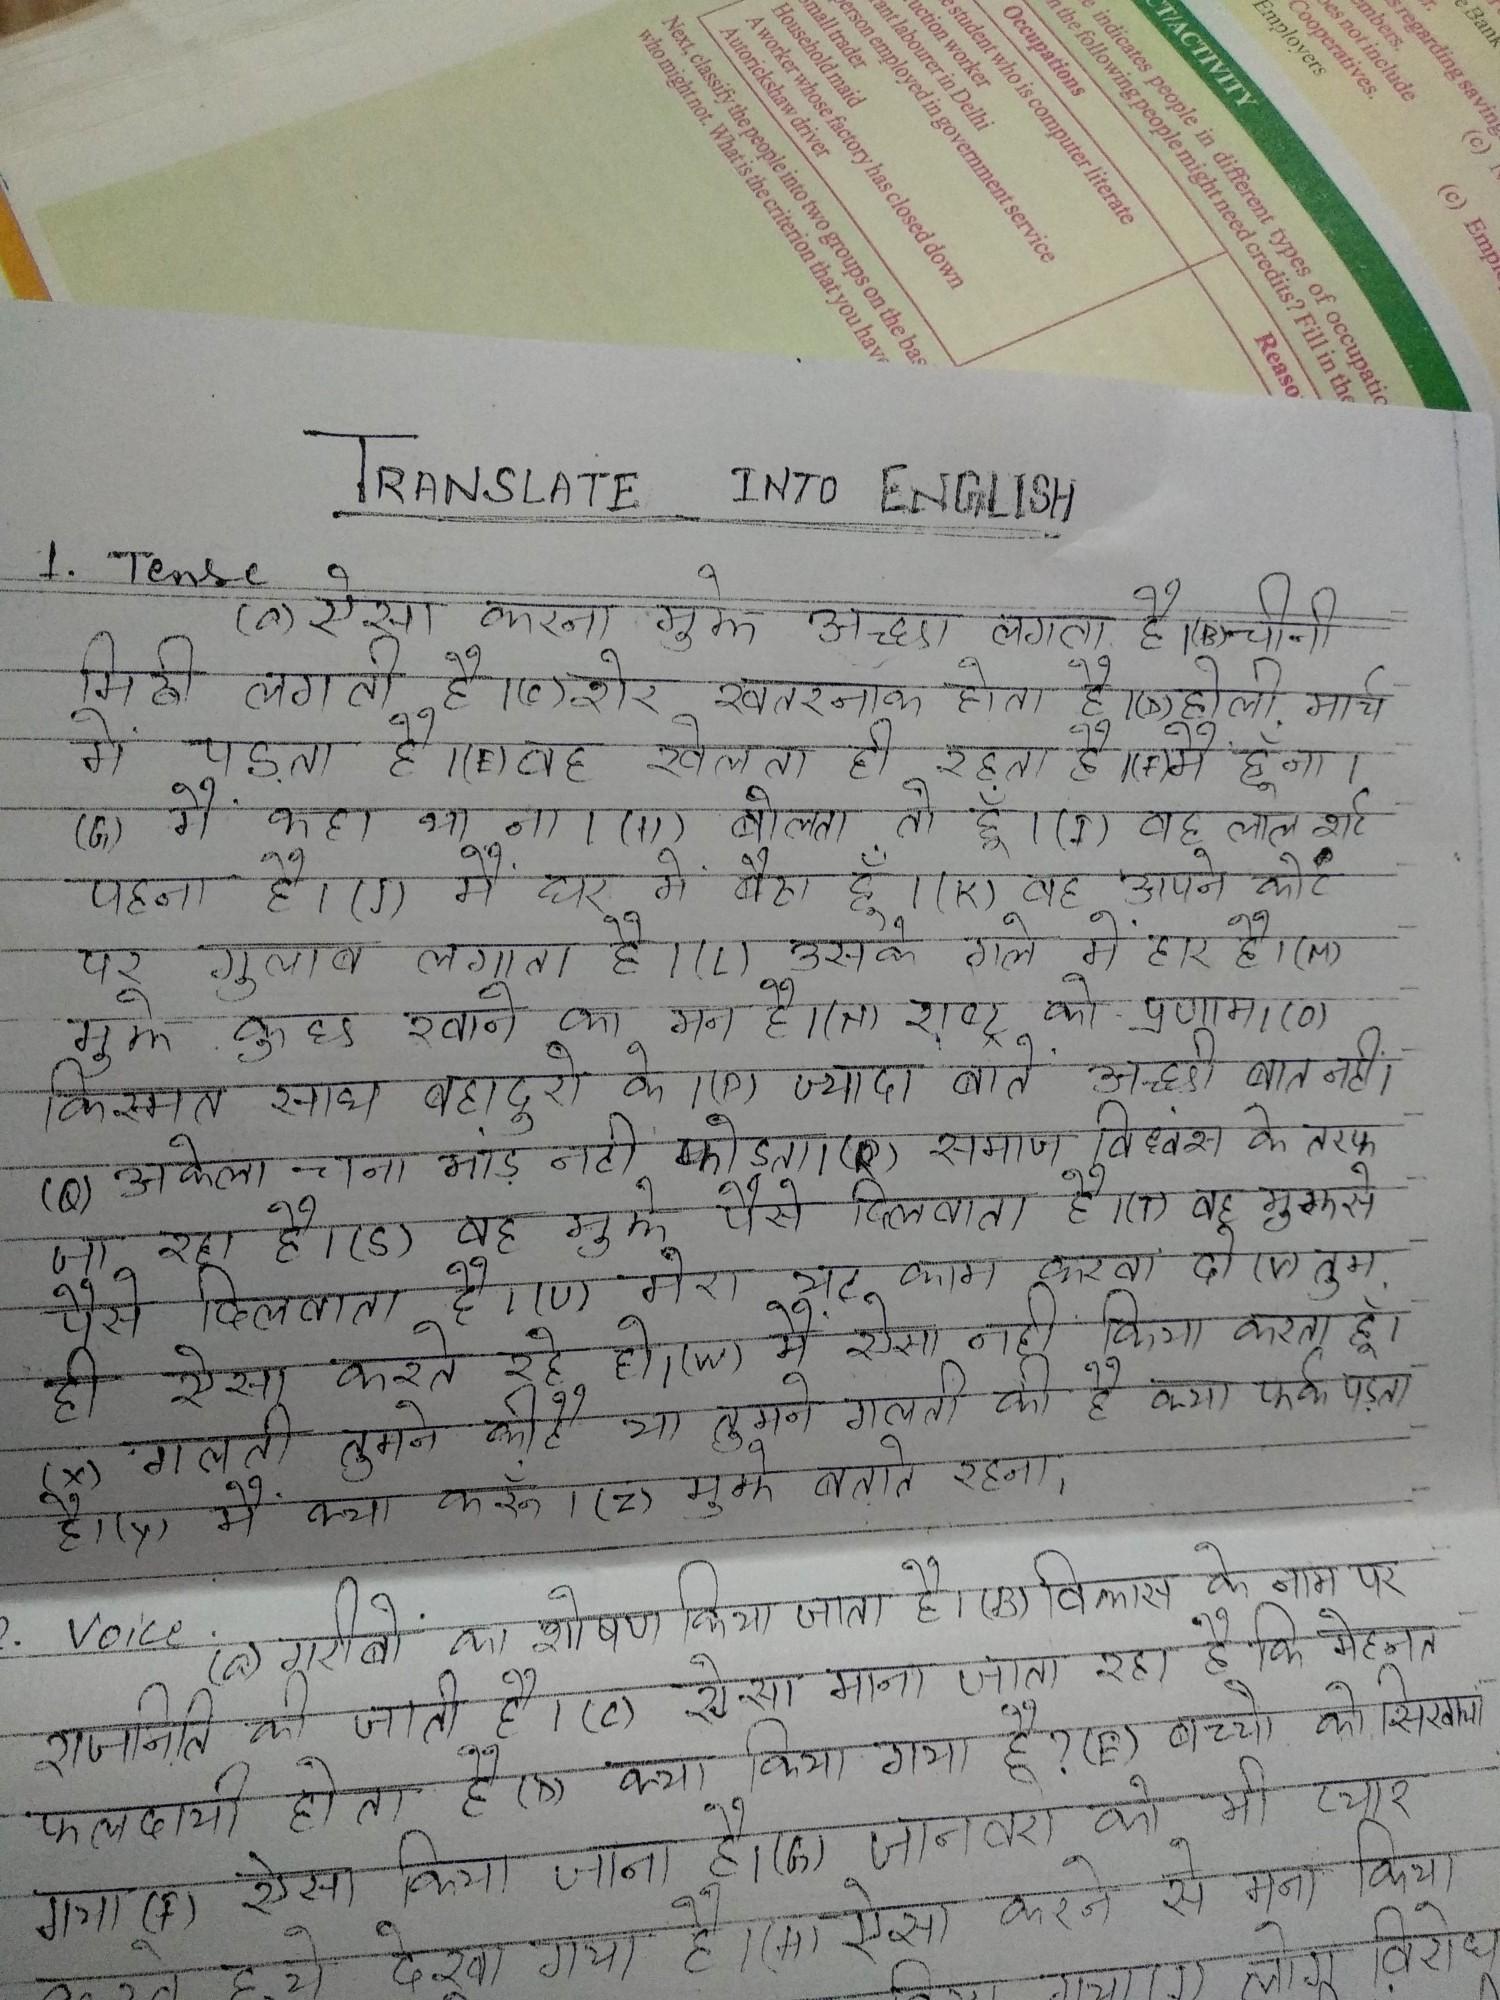 please translate into english please sab copy par bana kar send